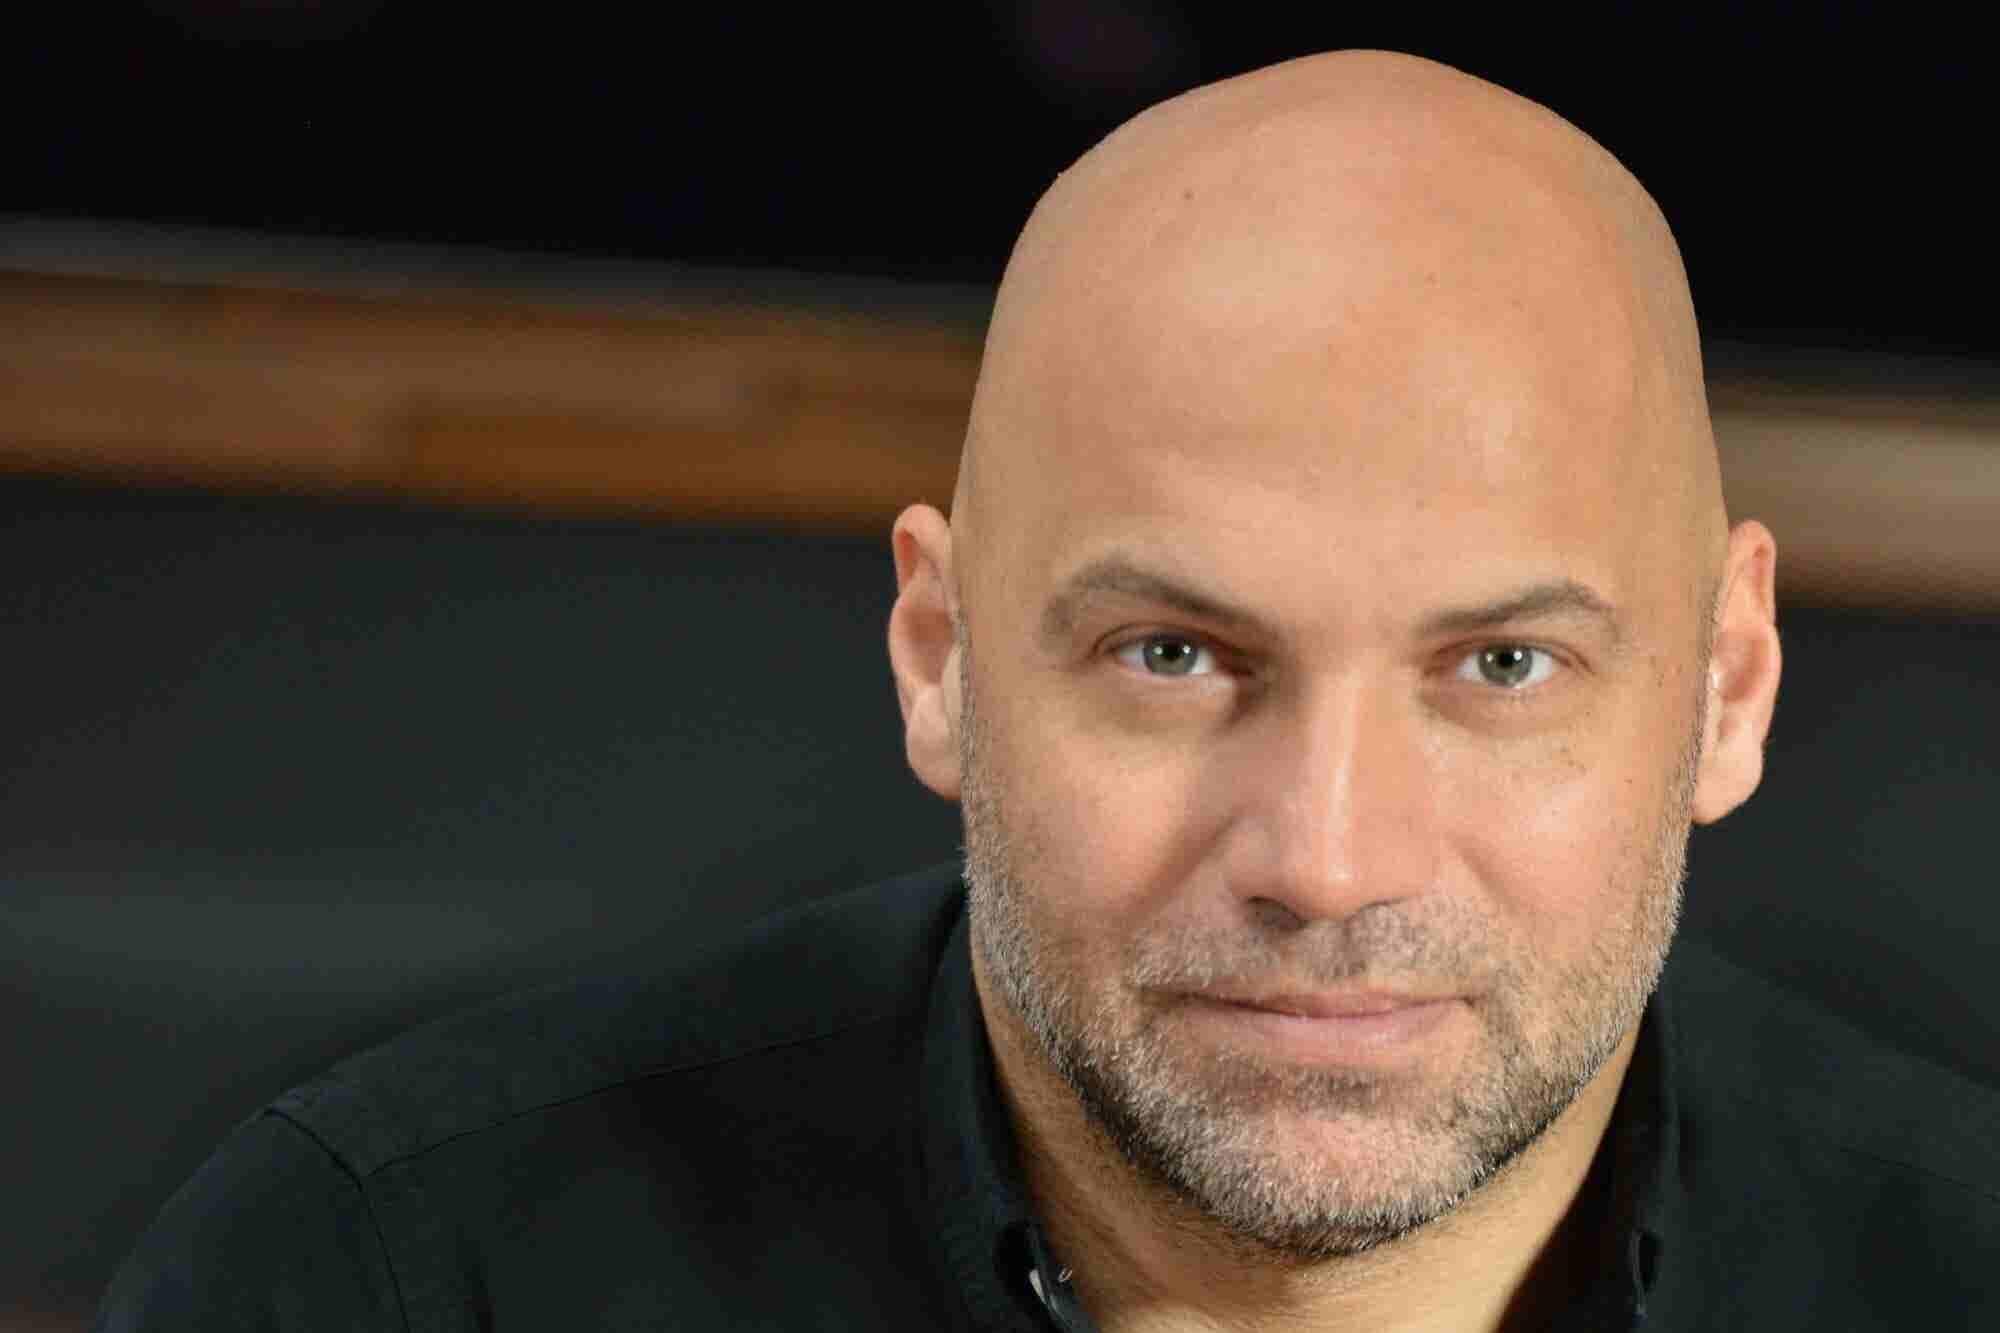 Rethinking The Status Quo: Monty Mobile Founder Mountasser Hachem